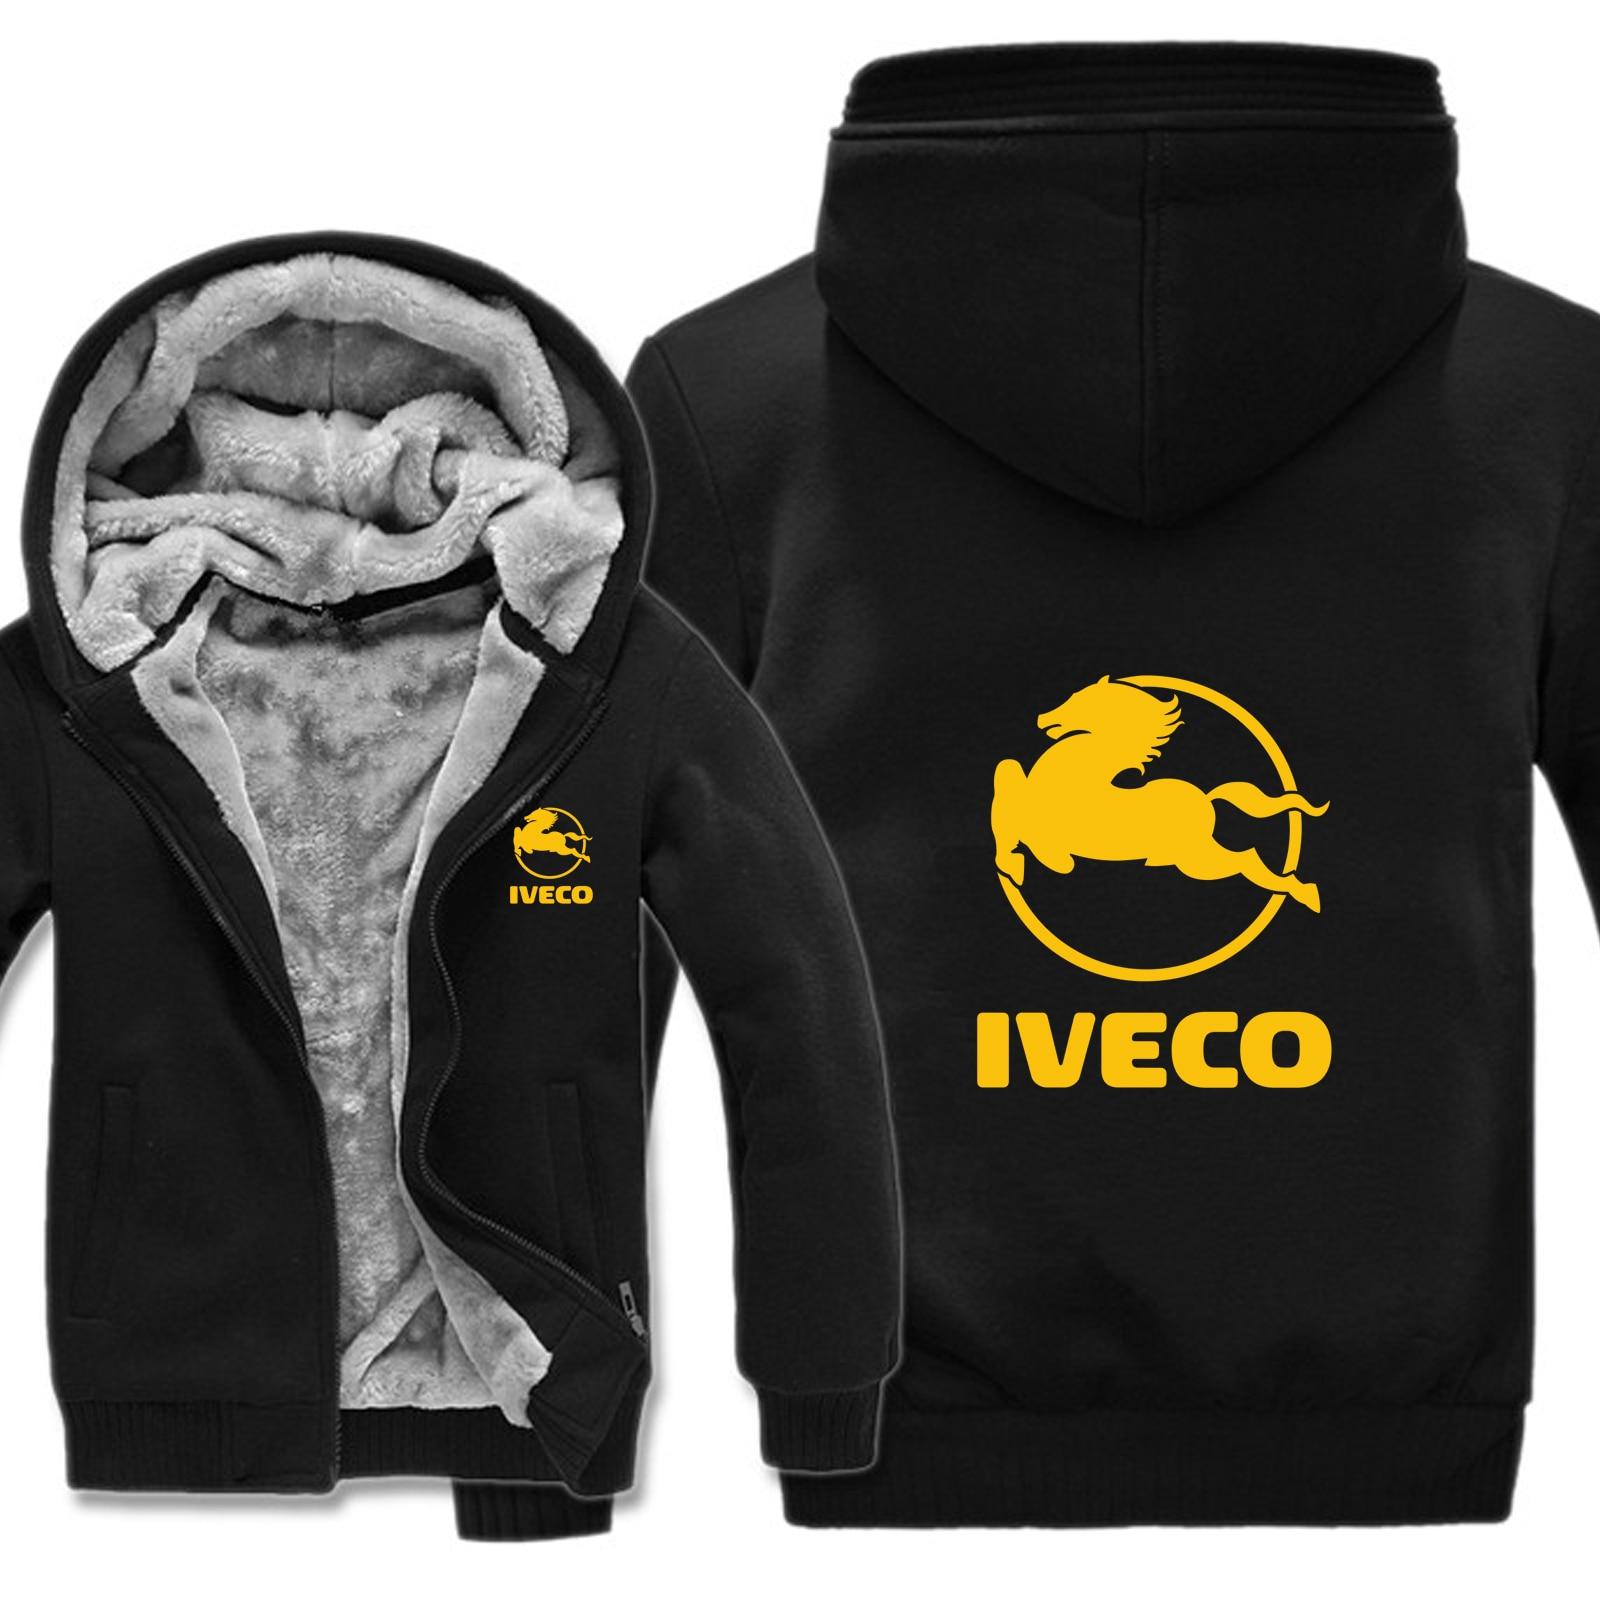 Image 2 - Winter Iveco Truck Hoodies Men Fashion Coat Pullover Wool Liner Jacket Iveco Sweatshirts Hoody HS 004-in Hoodies & Sweatshirts from Men's Clothing